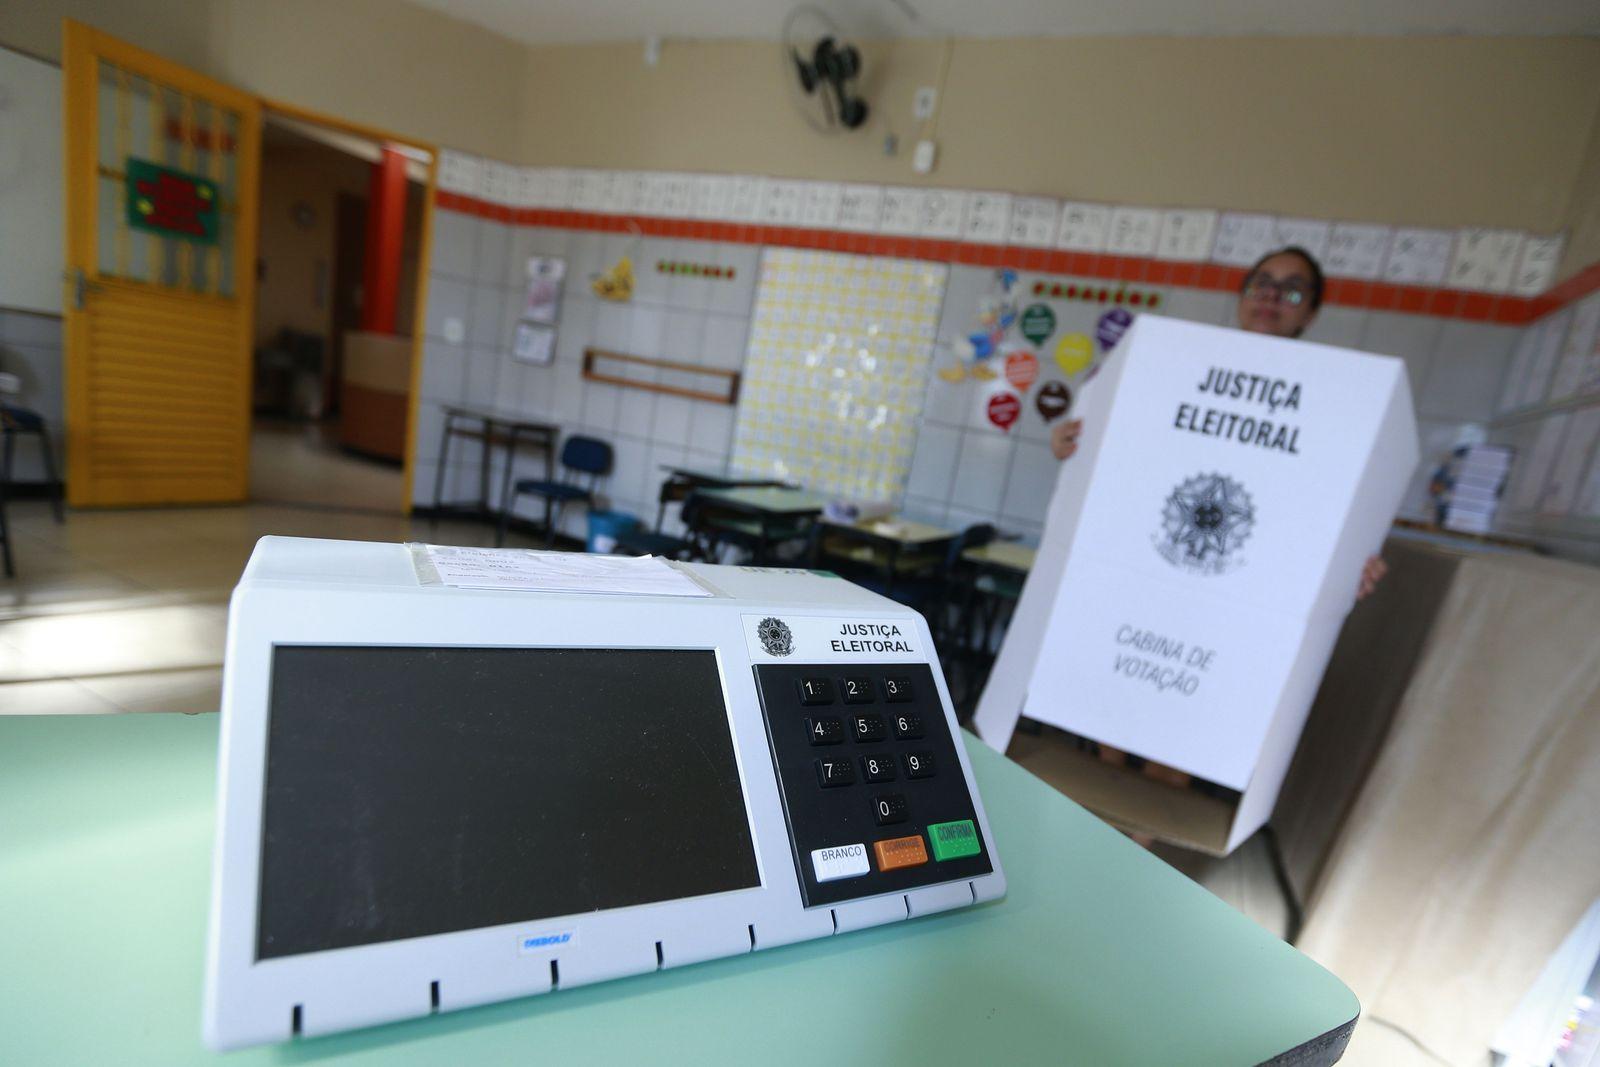 elektronische Wahlurne/ Brasilien/